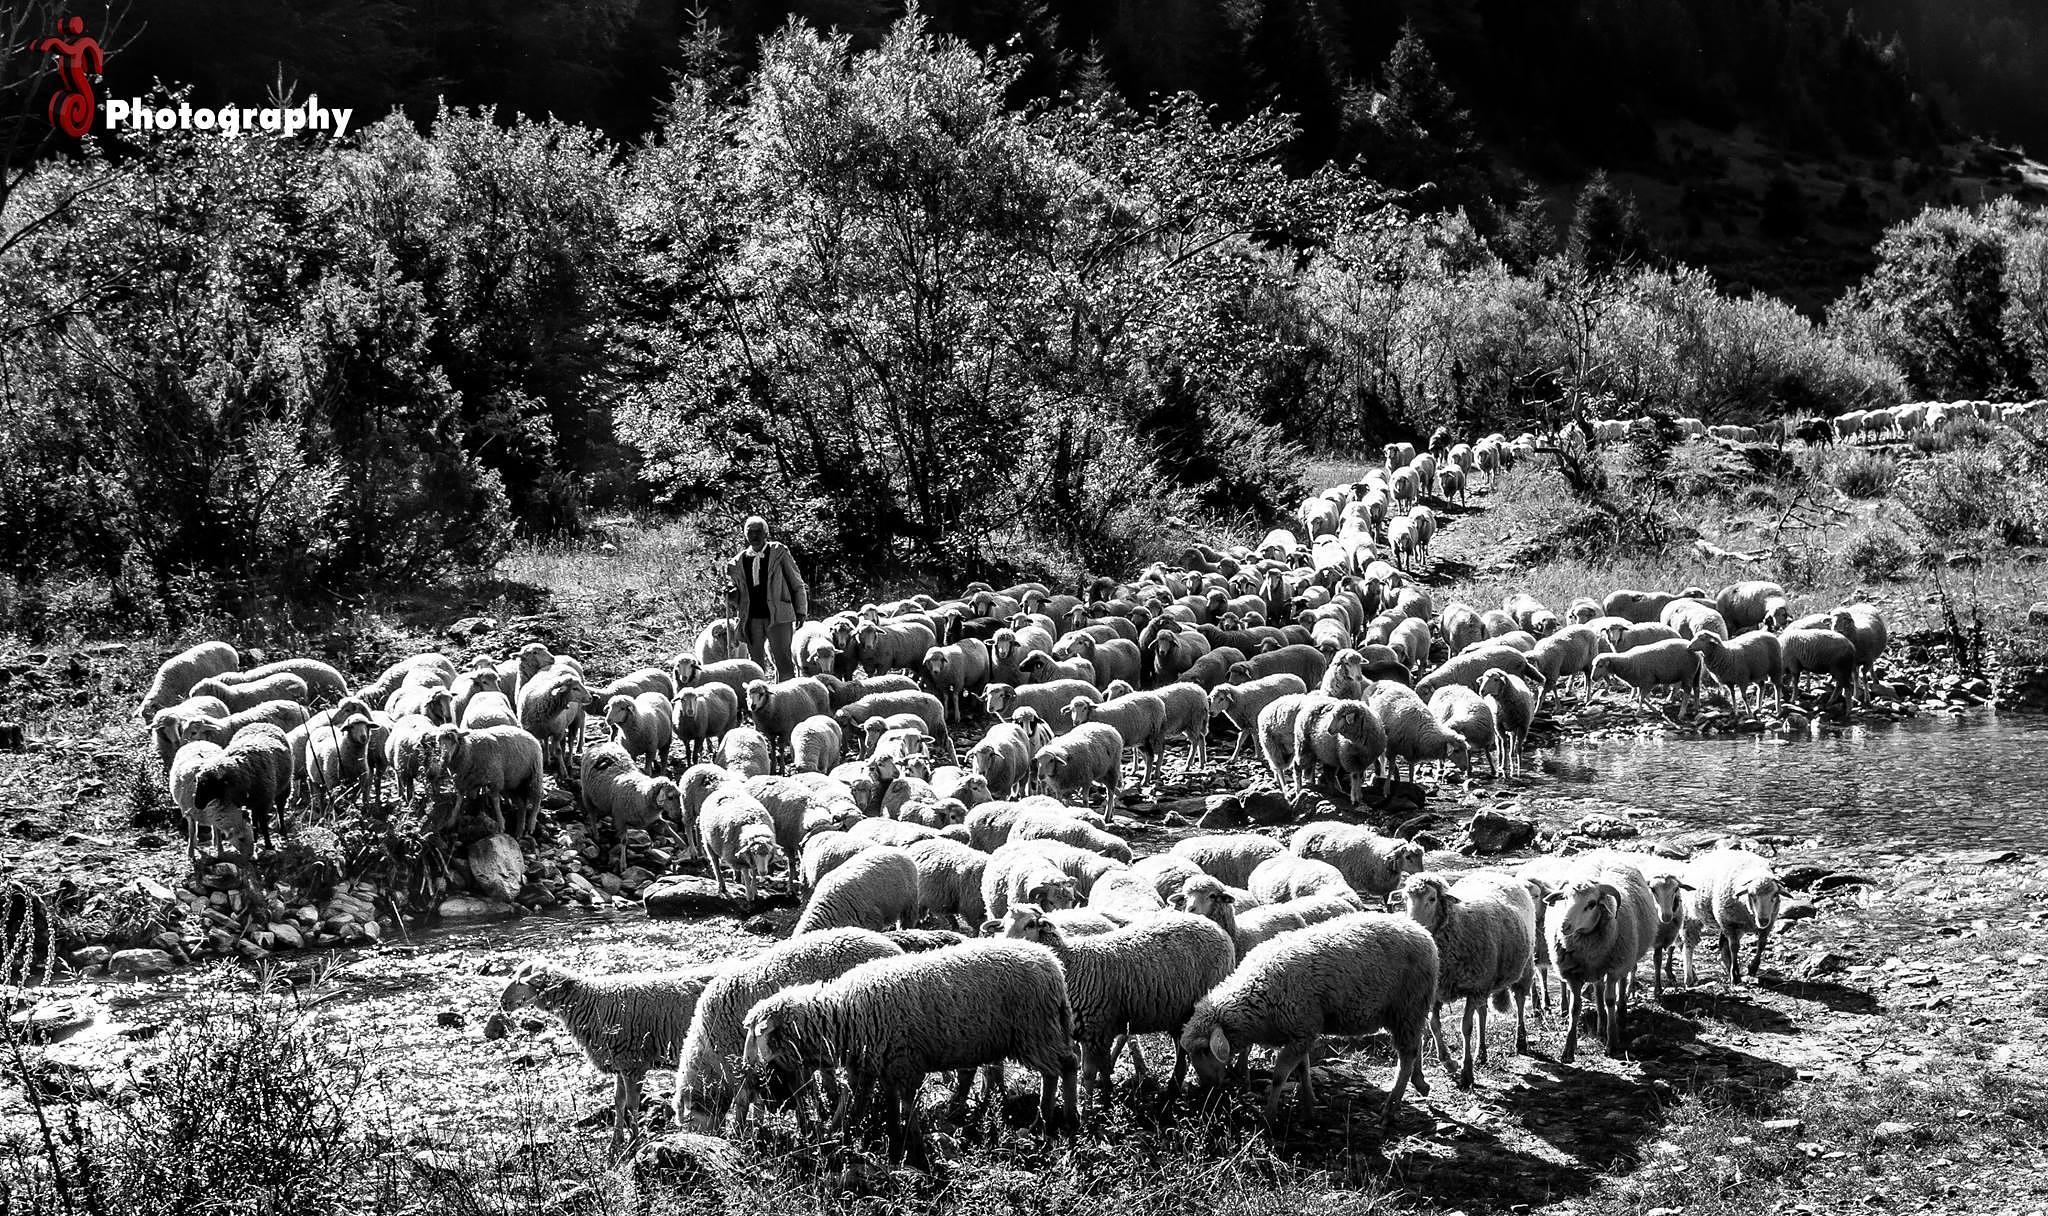 Sheeps by Jetmir Sejdia